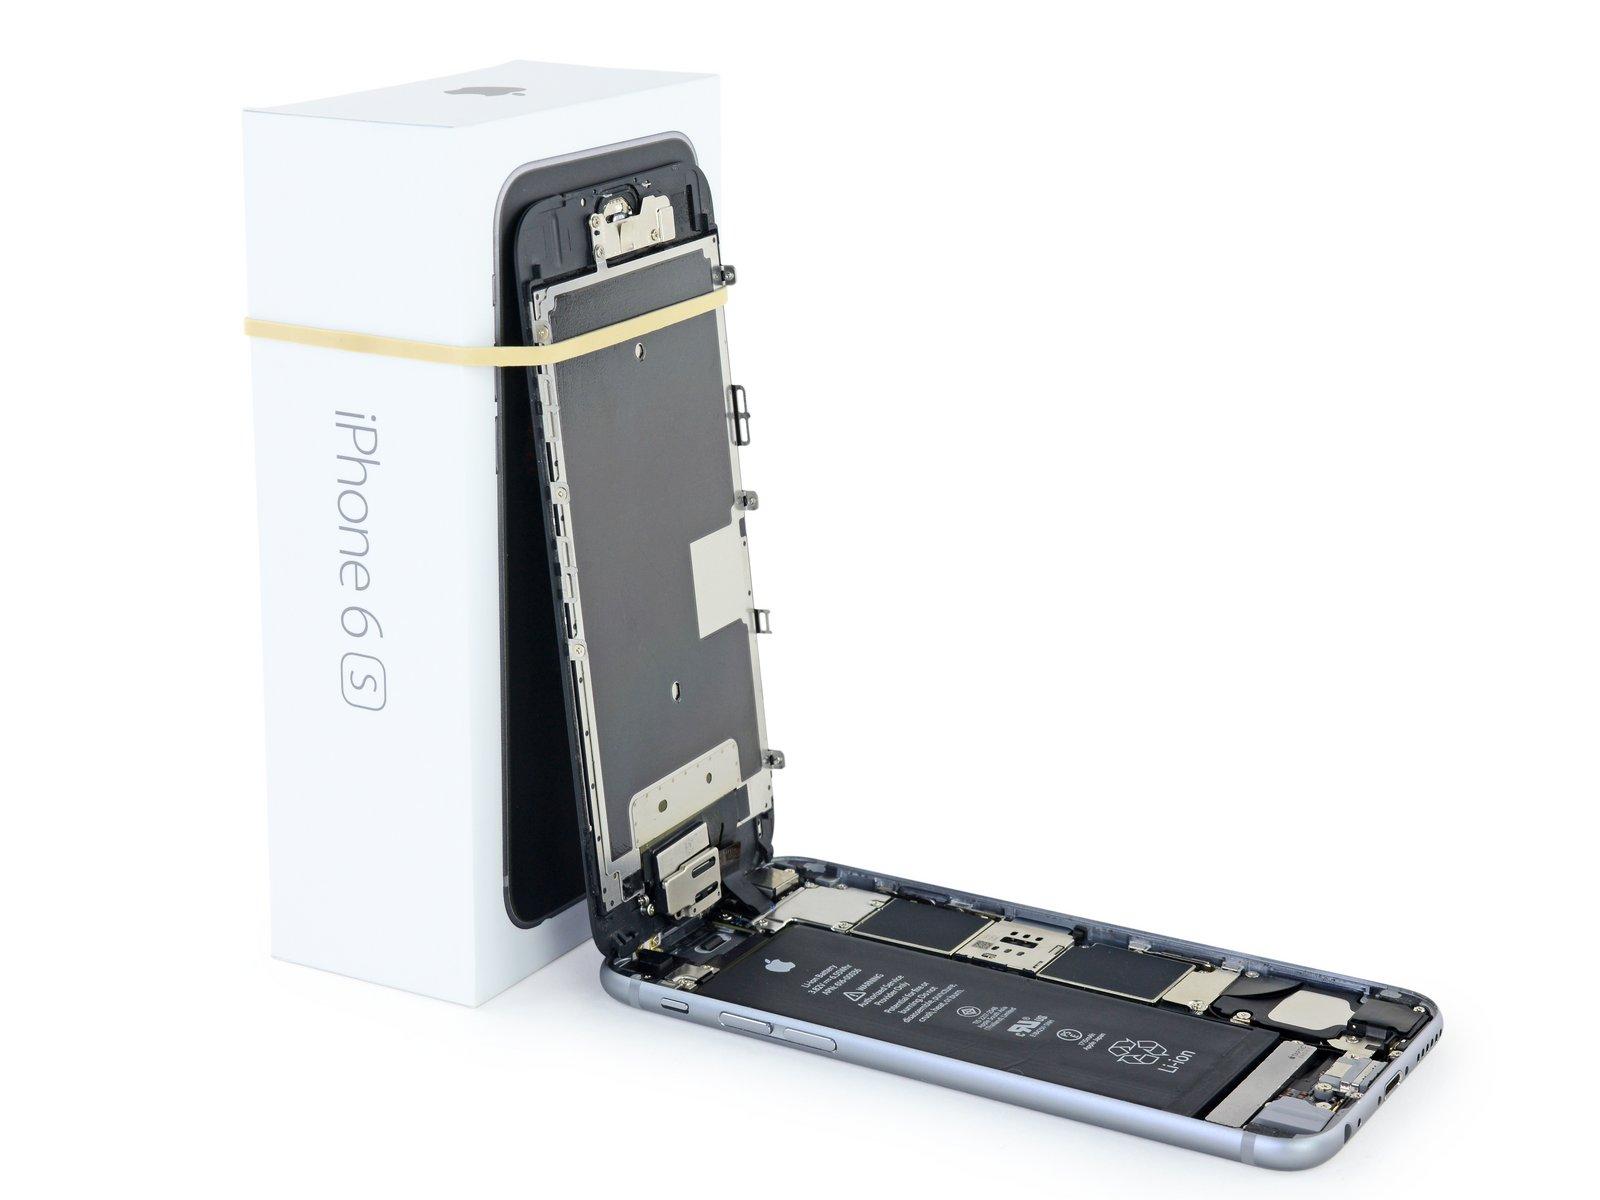 iPhone 6s Akku tauschen - iFixit Reparaturanleitung